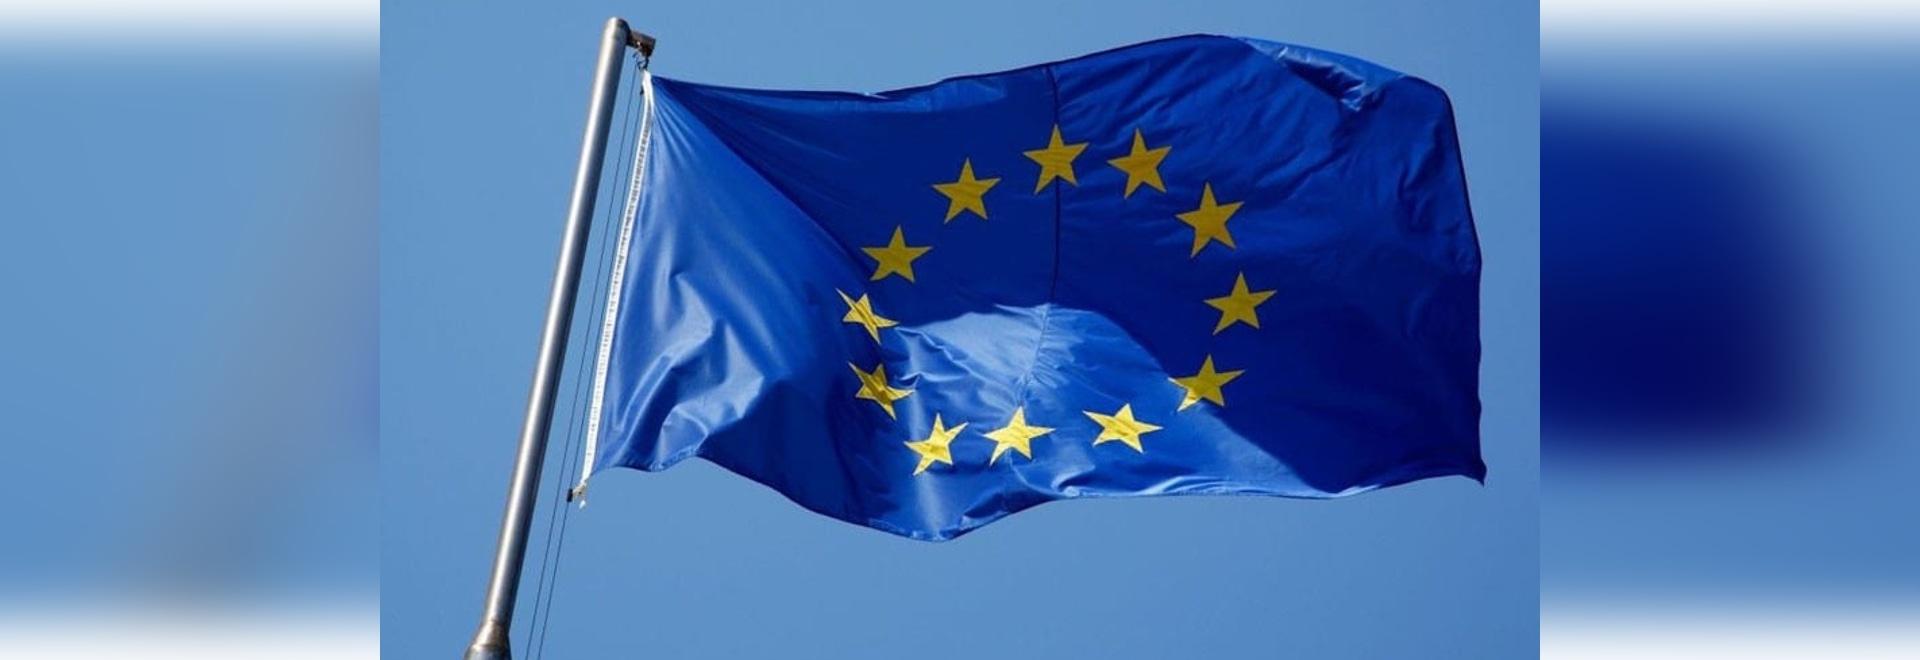 European Commission moves to improve seafarers' welfare